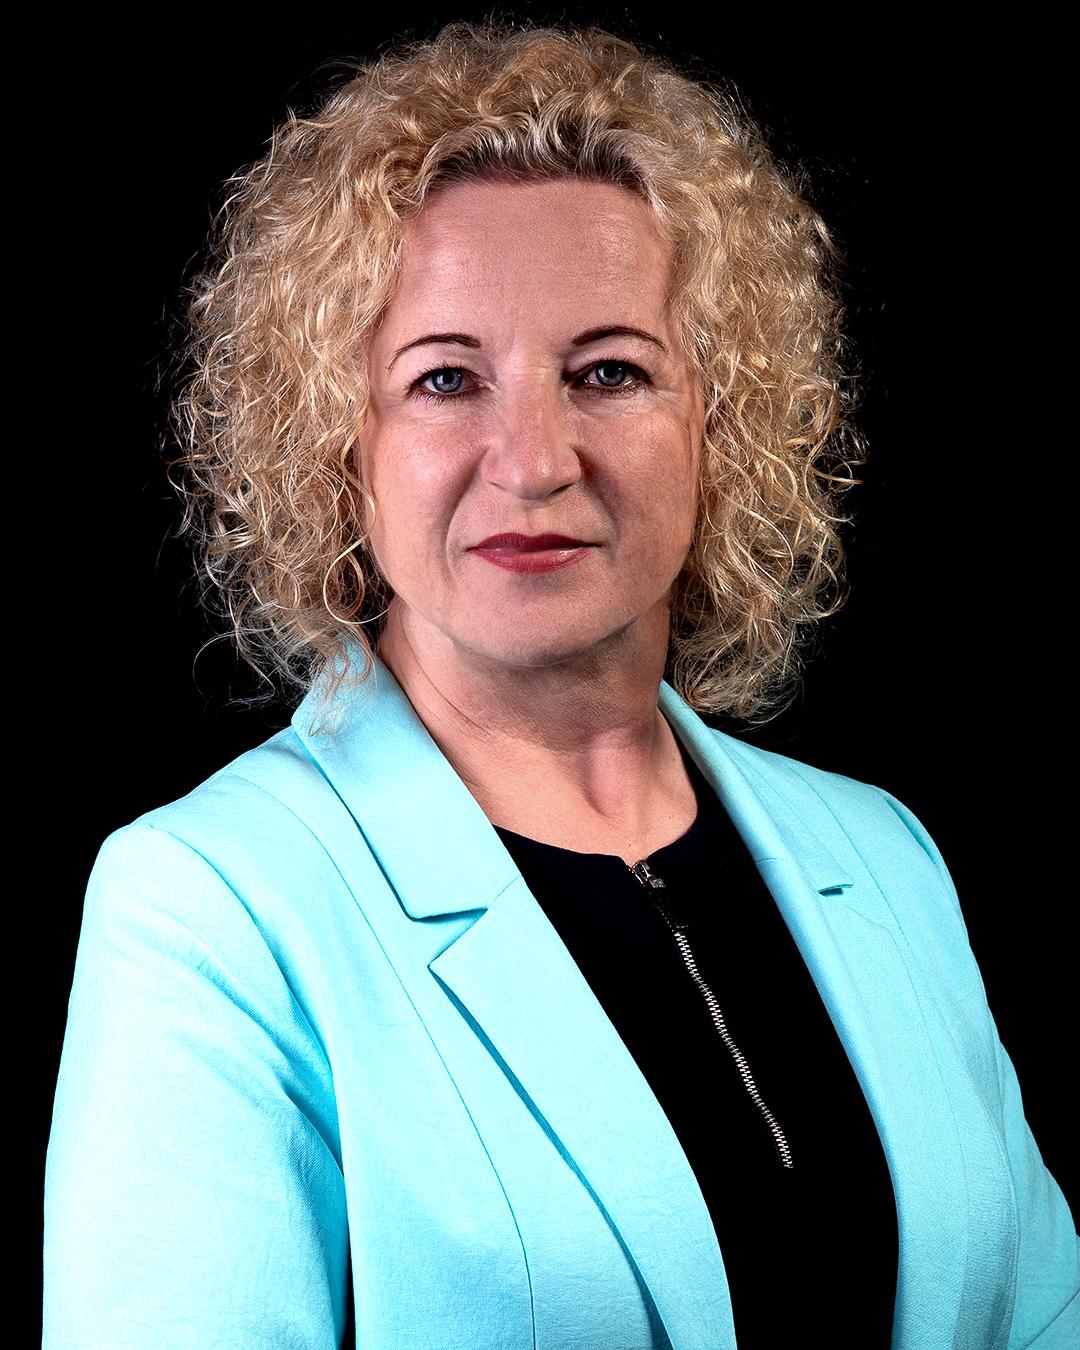 Dorota Piekutowska